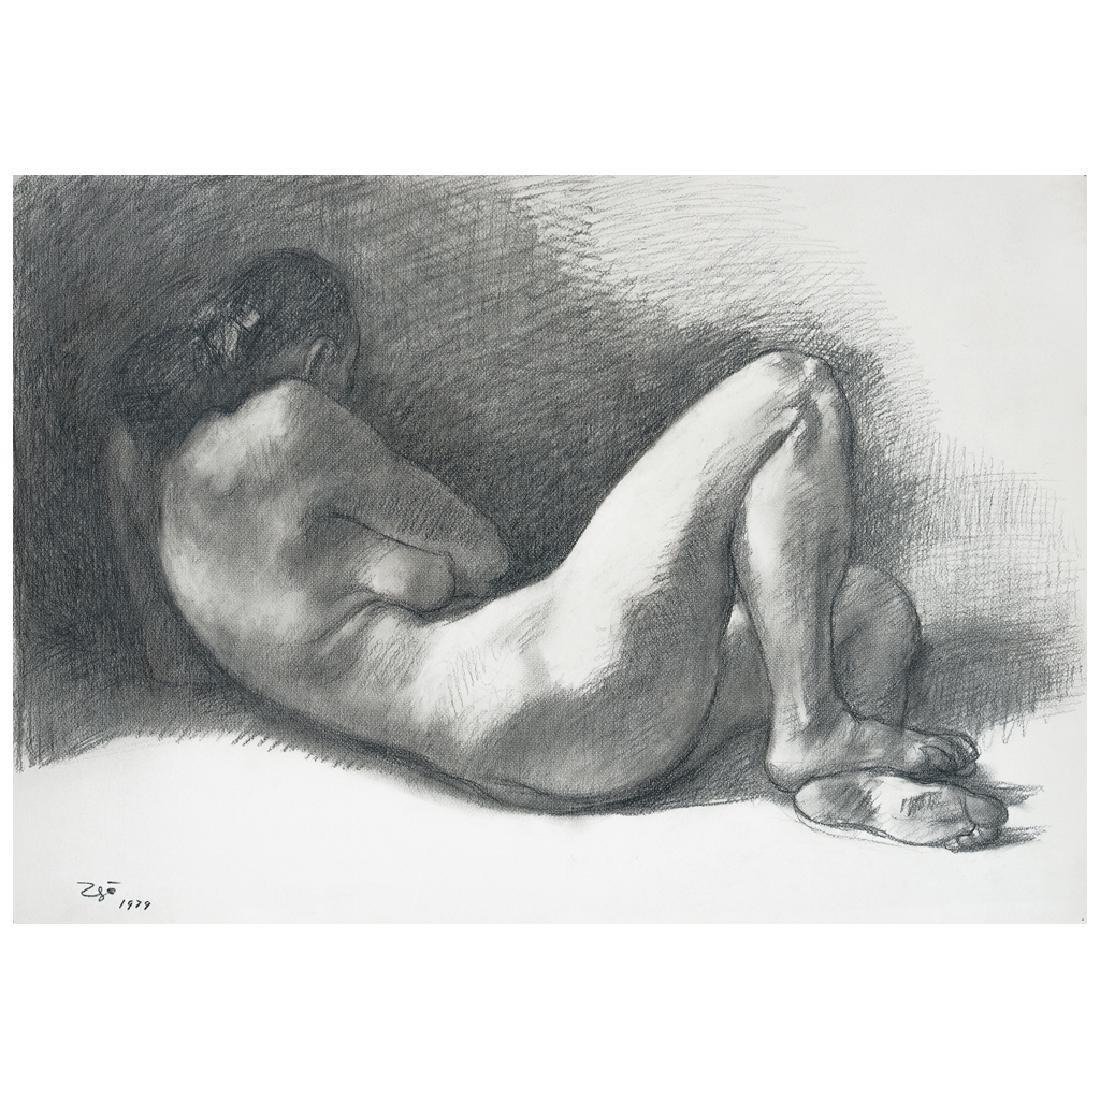 FRANCISCO ZuNIGA, Desnudo #2, Signed and dated 1979,